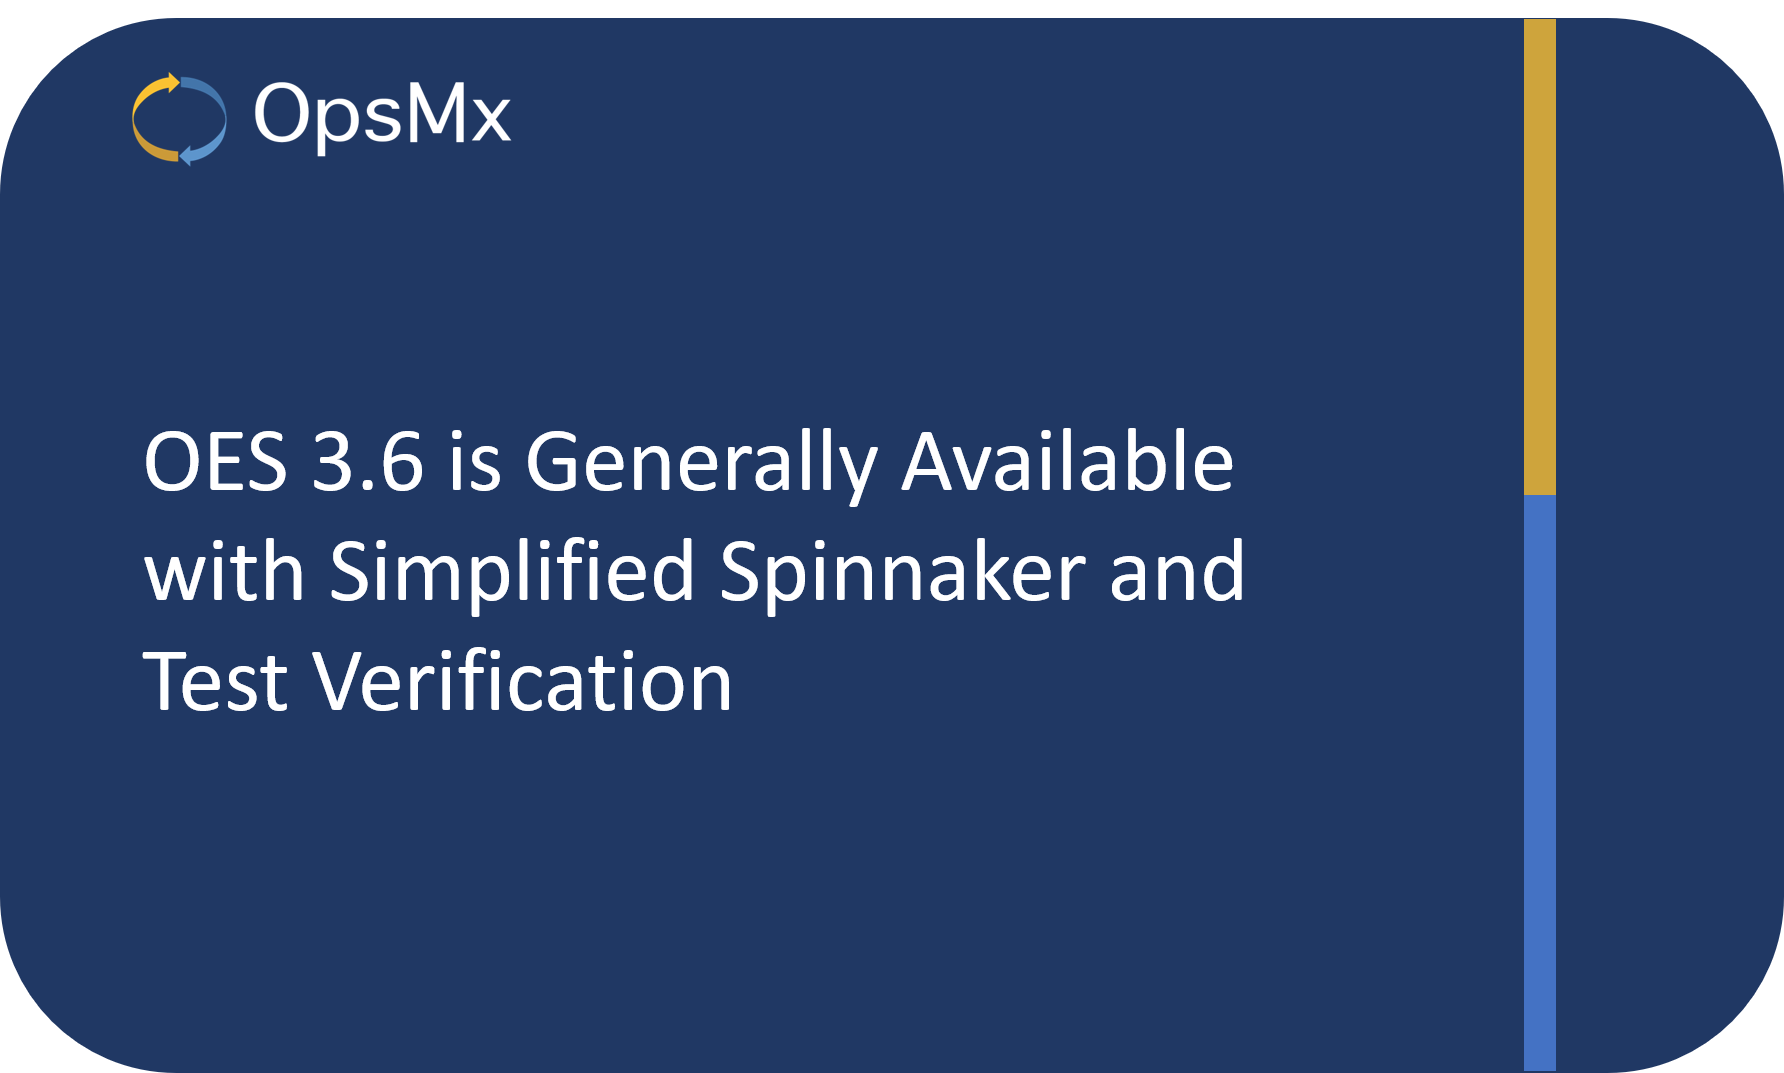 OpsMx Enterprise for Spinnaker 3.6 is GA